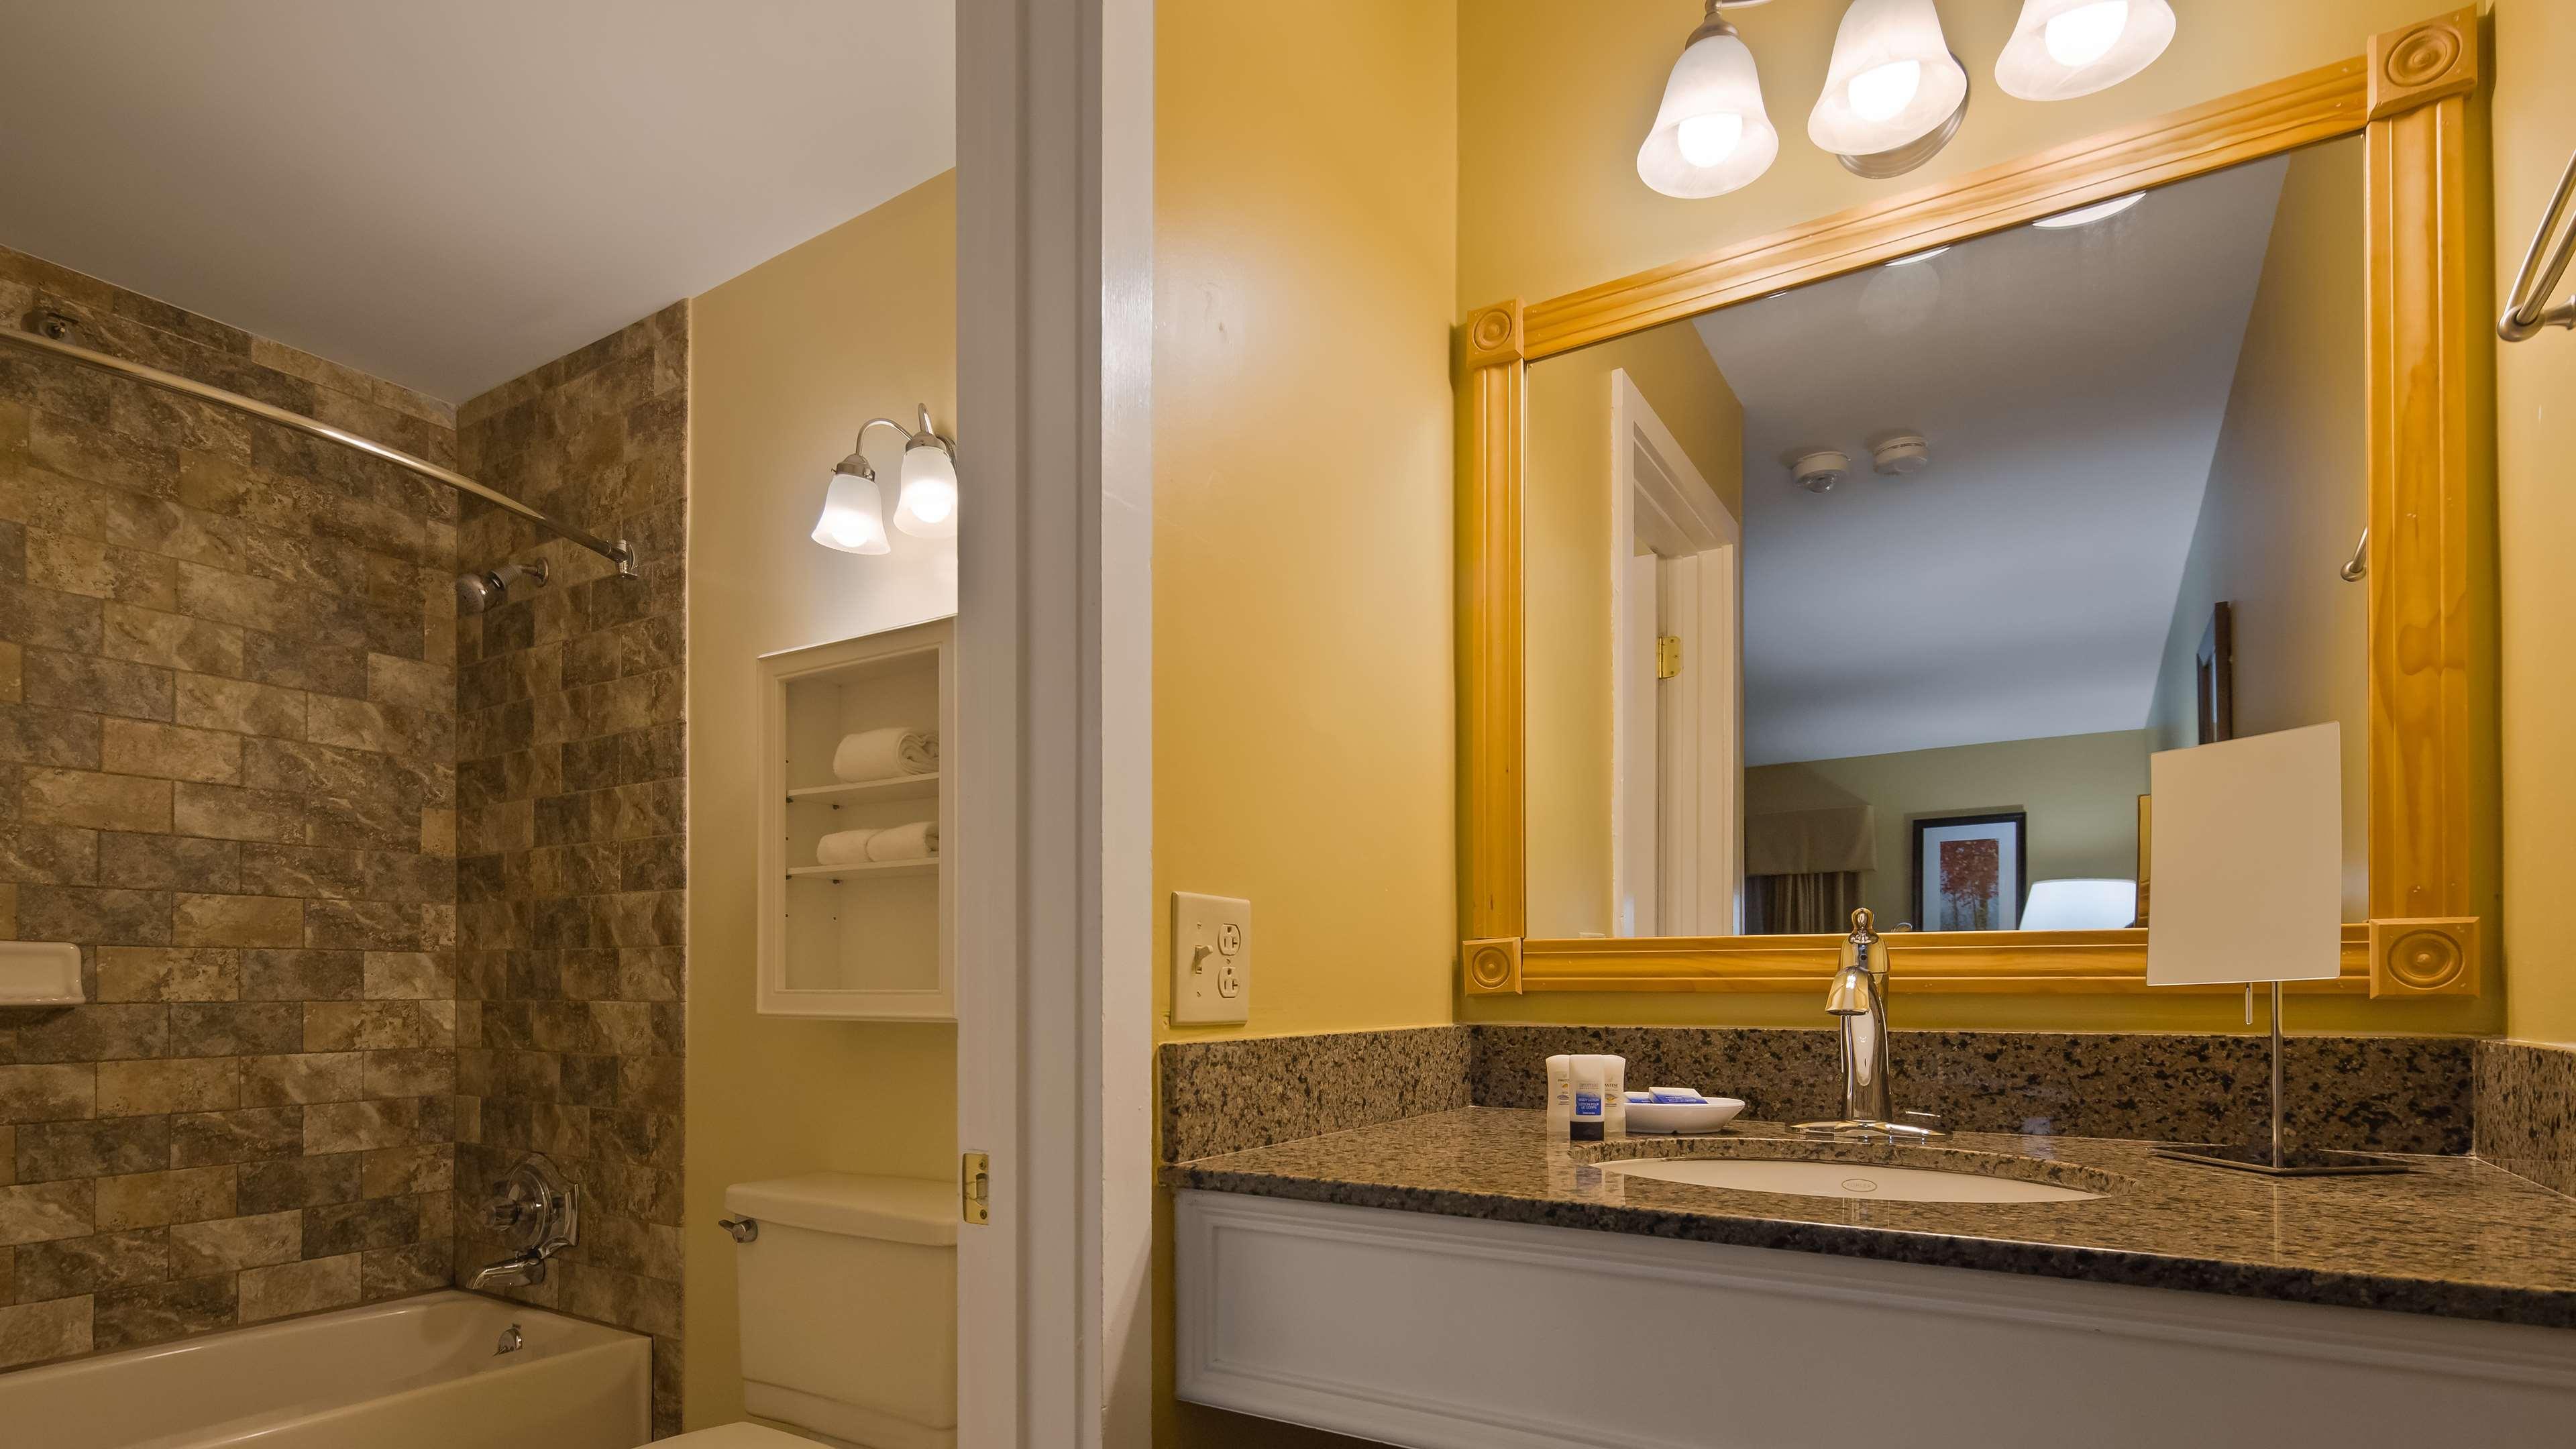 Best Western Plus Windjammer Inn & Conference Center image 31